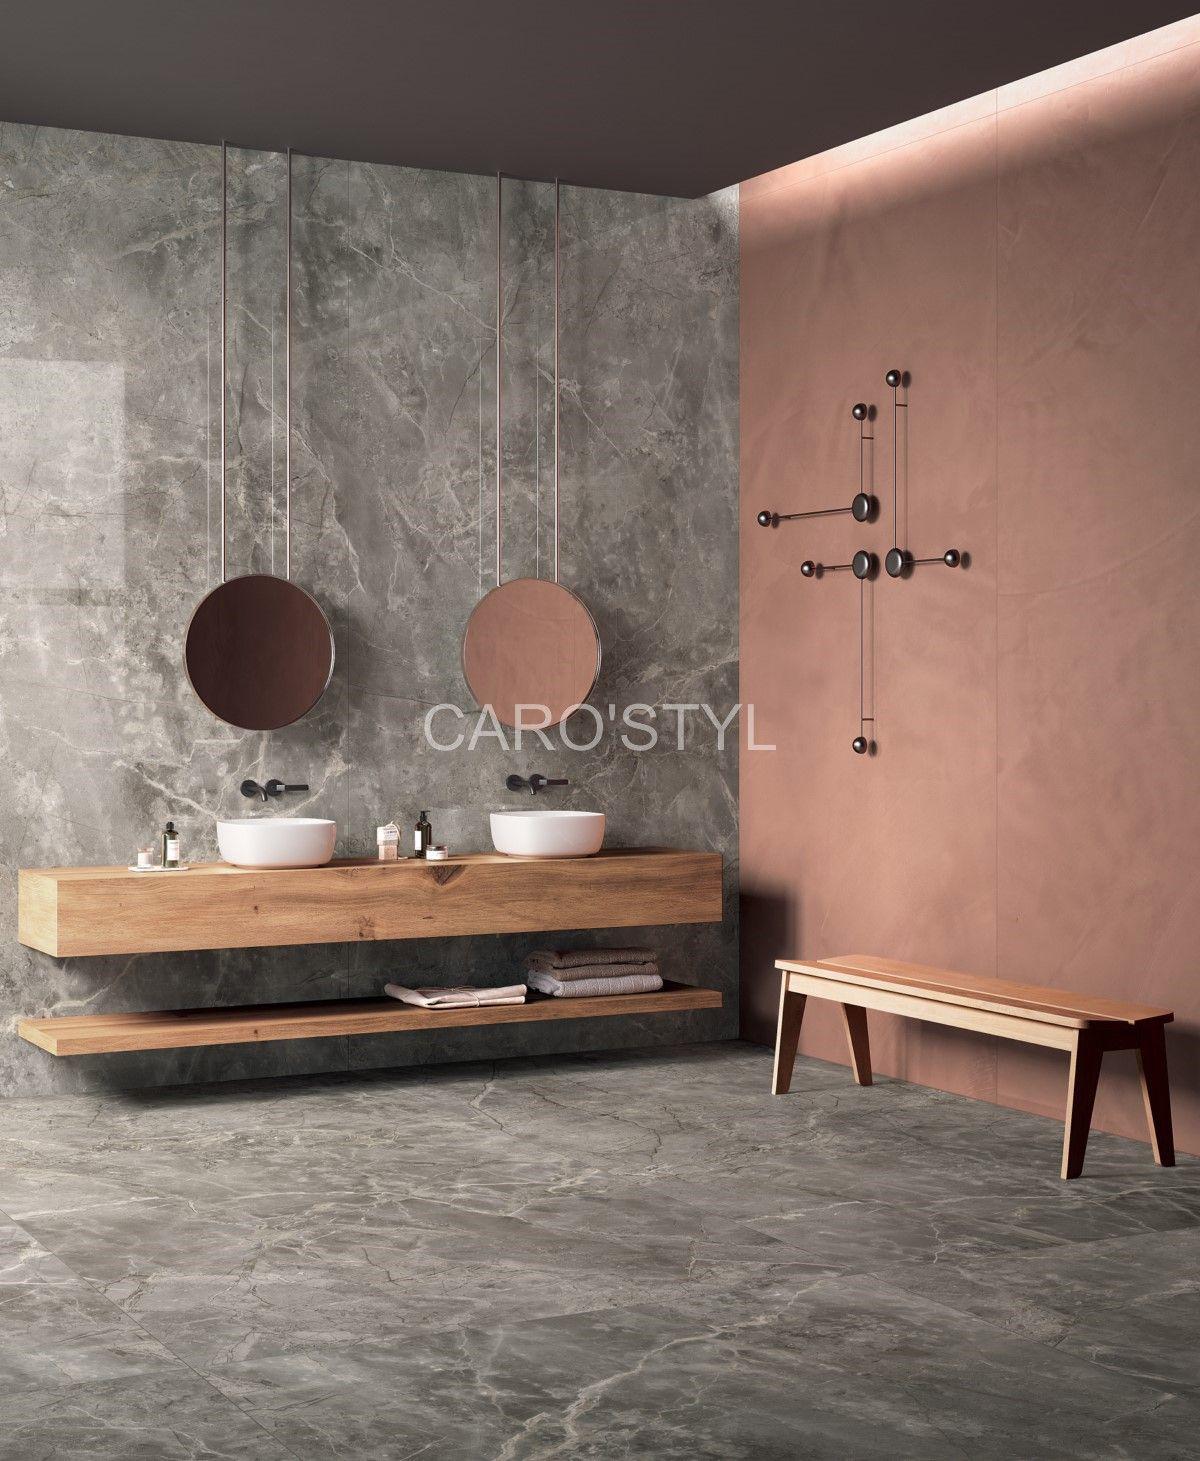 carrelage tendance effet marbre aux grands formats. Black Bedroom Furniture Sets. Home Design Ideas